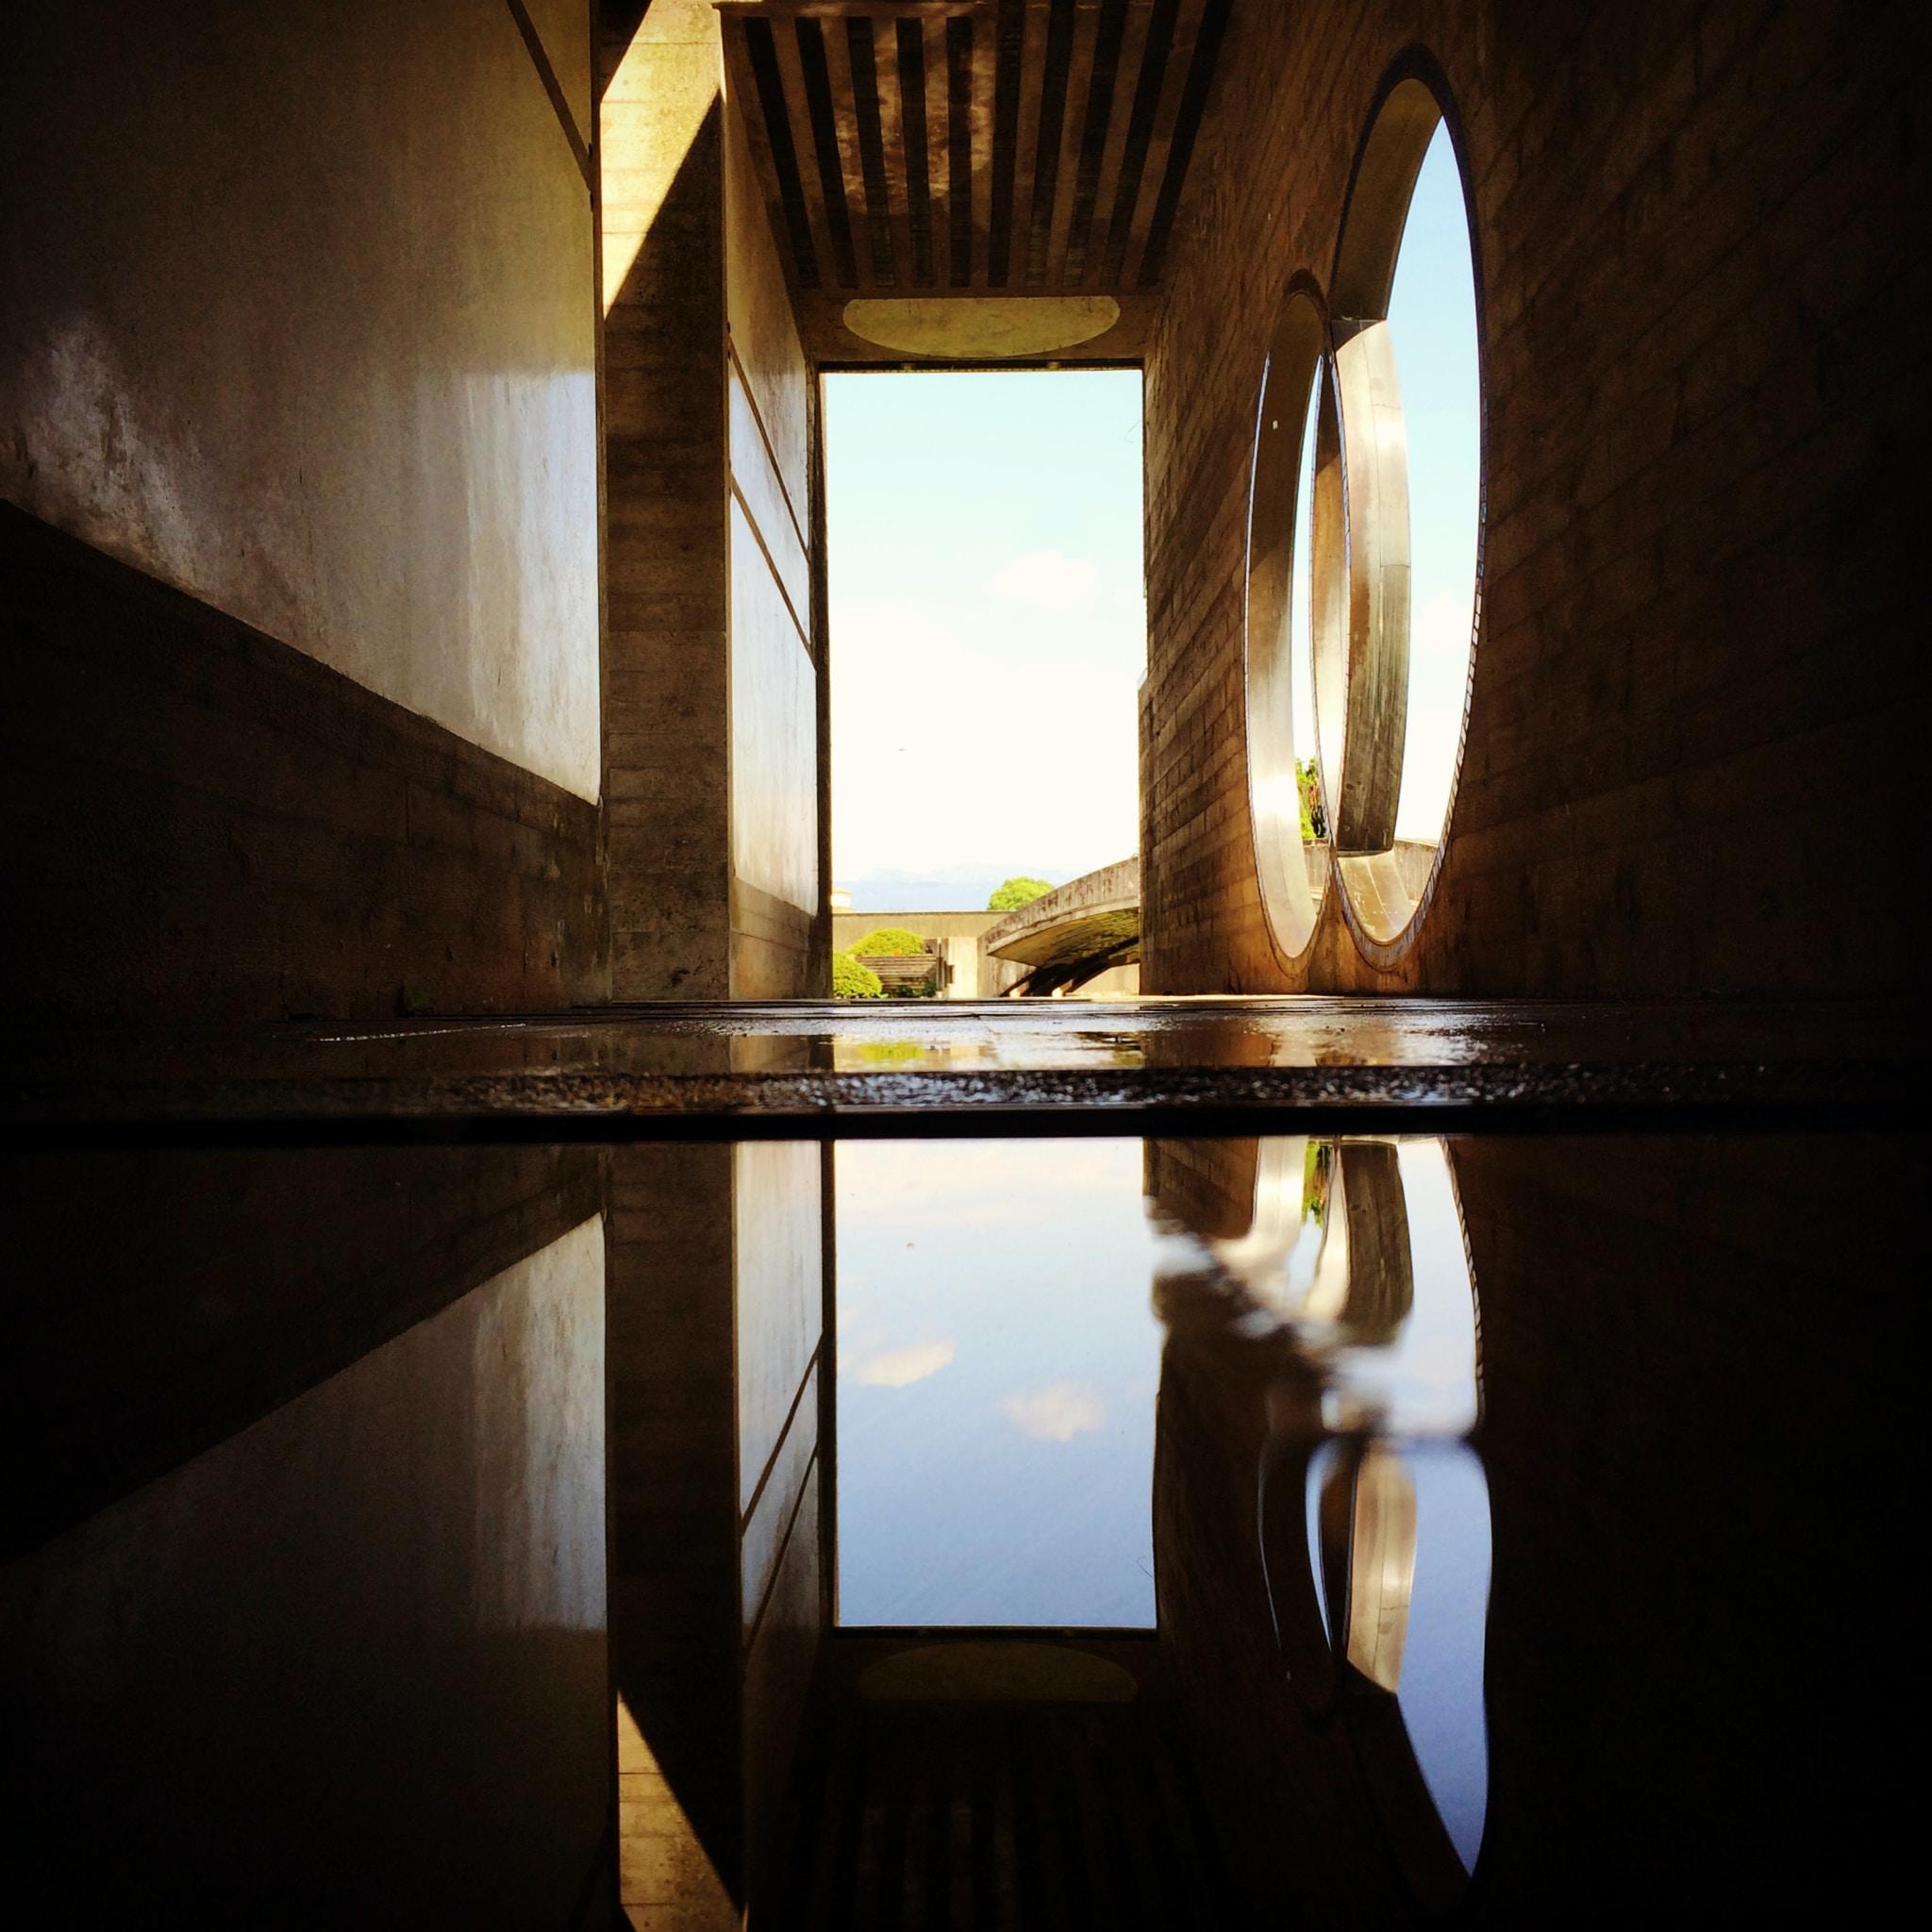 low angle photo of floor near wall